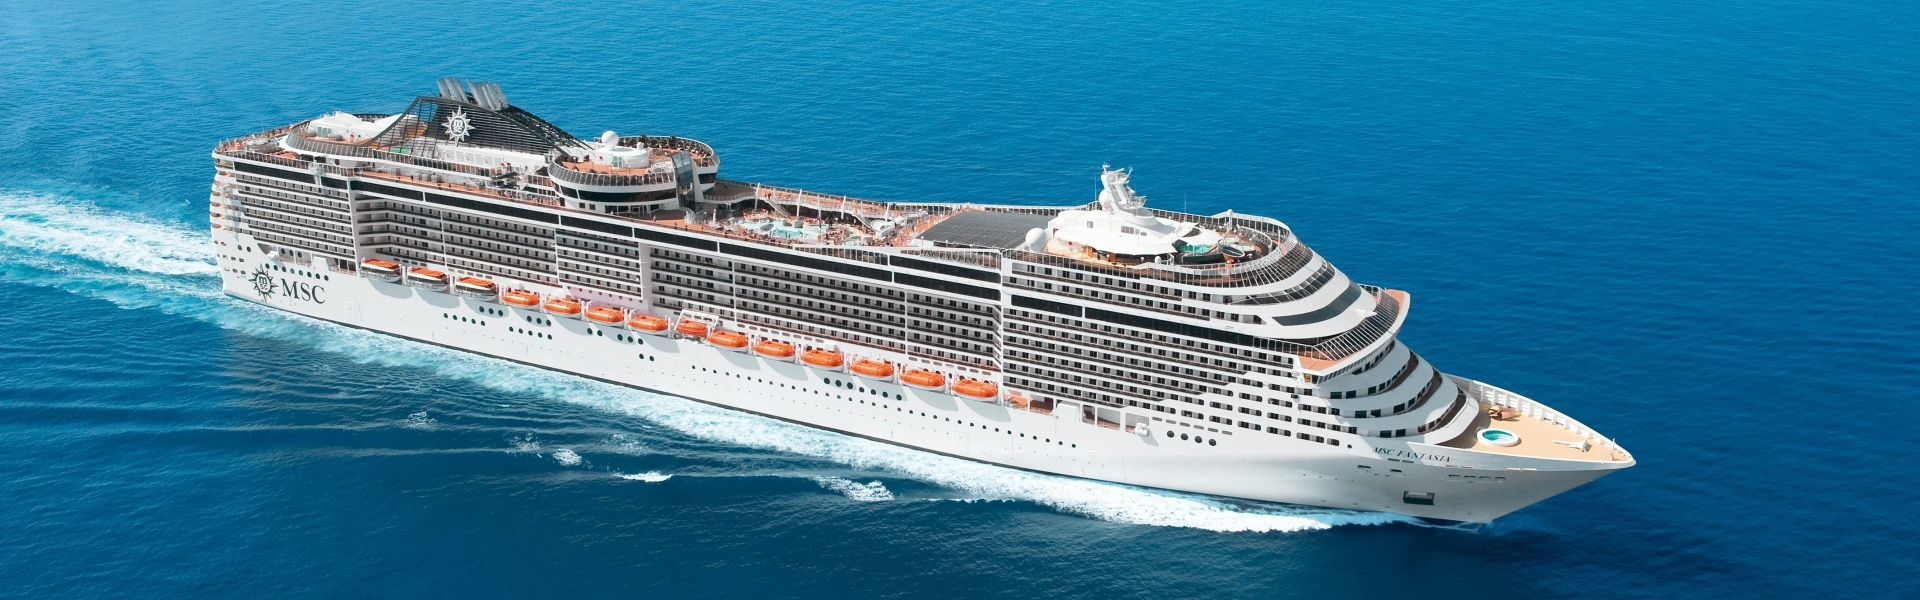 Croaziera 2017 - Caraibele de Est (Fort de France) - MSC Cruises - MSC Fantasia - 7 nopti